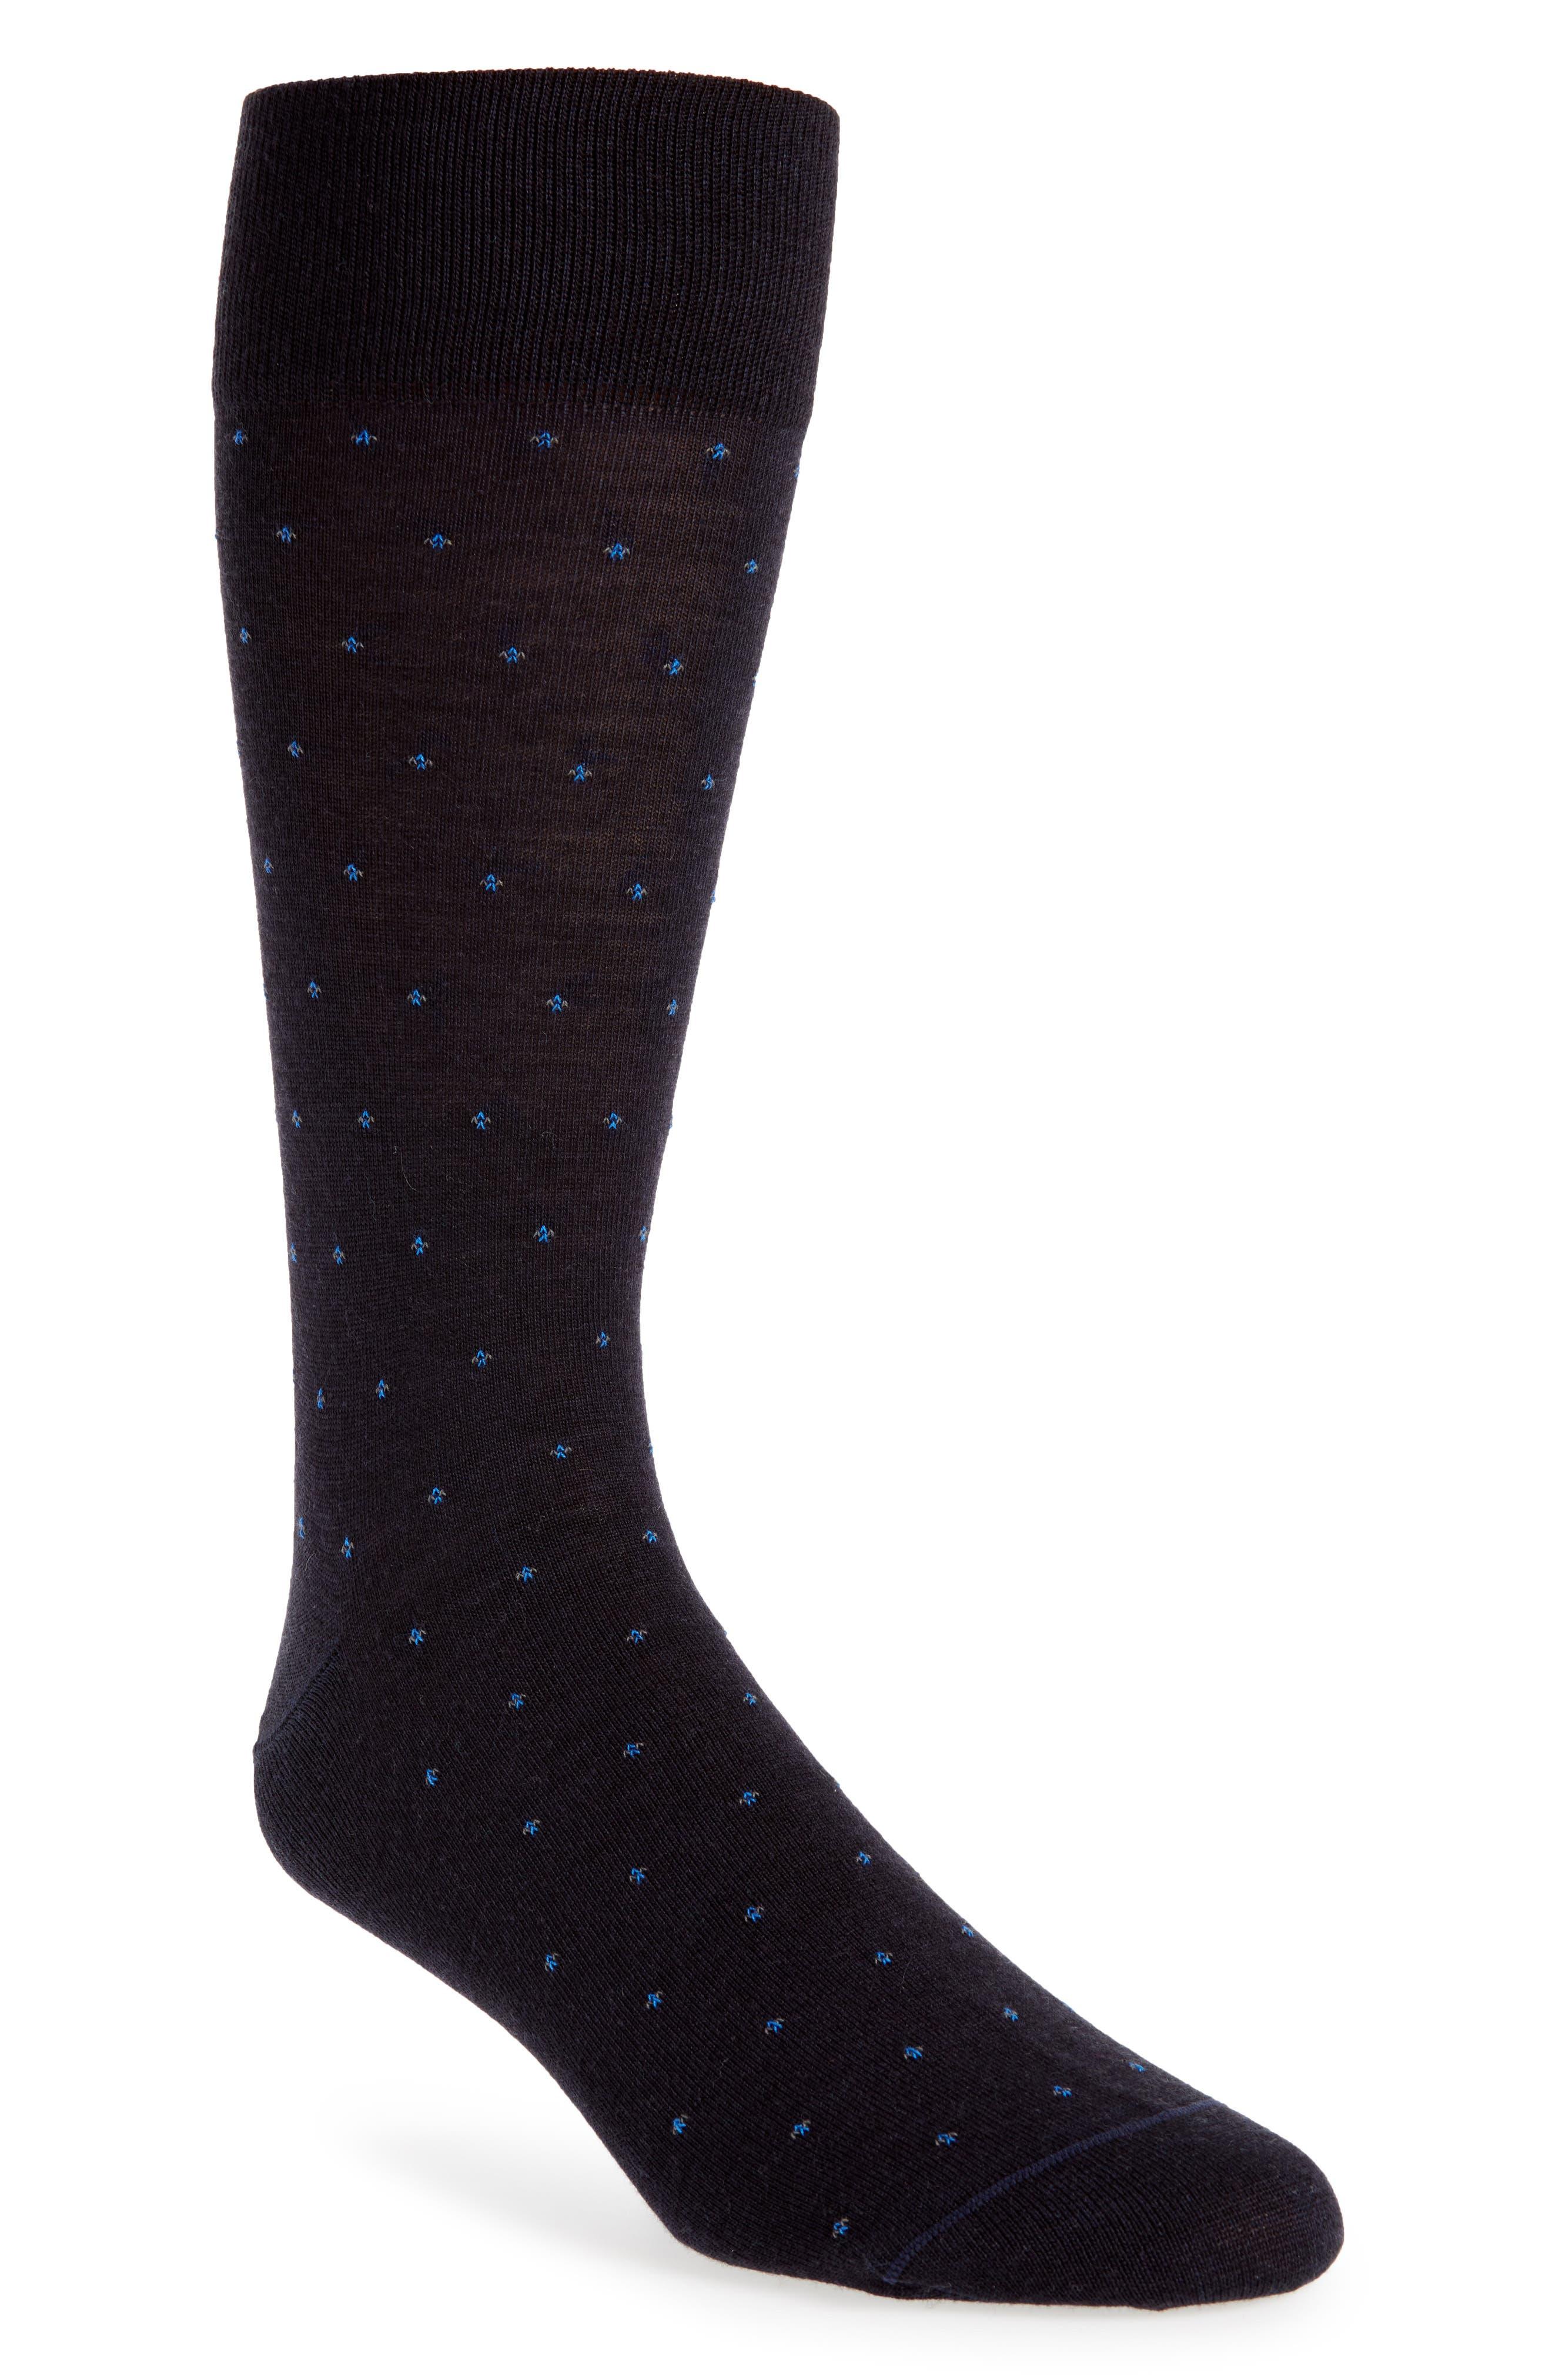 Neat Points Socks,                             Main thumbnail 1, color,                             Navy/ Blue